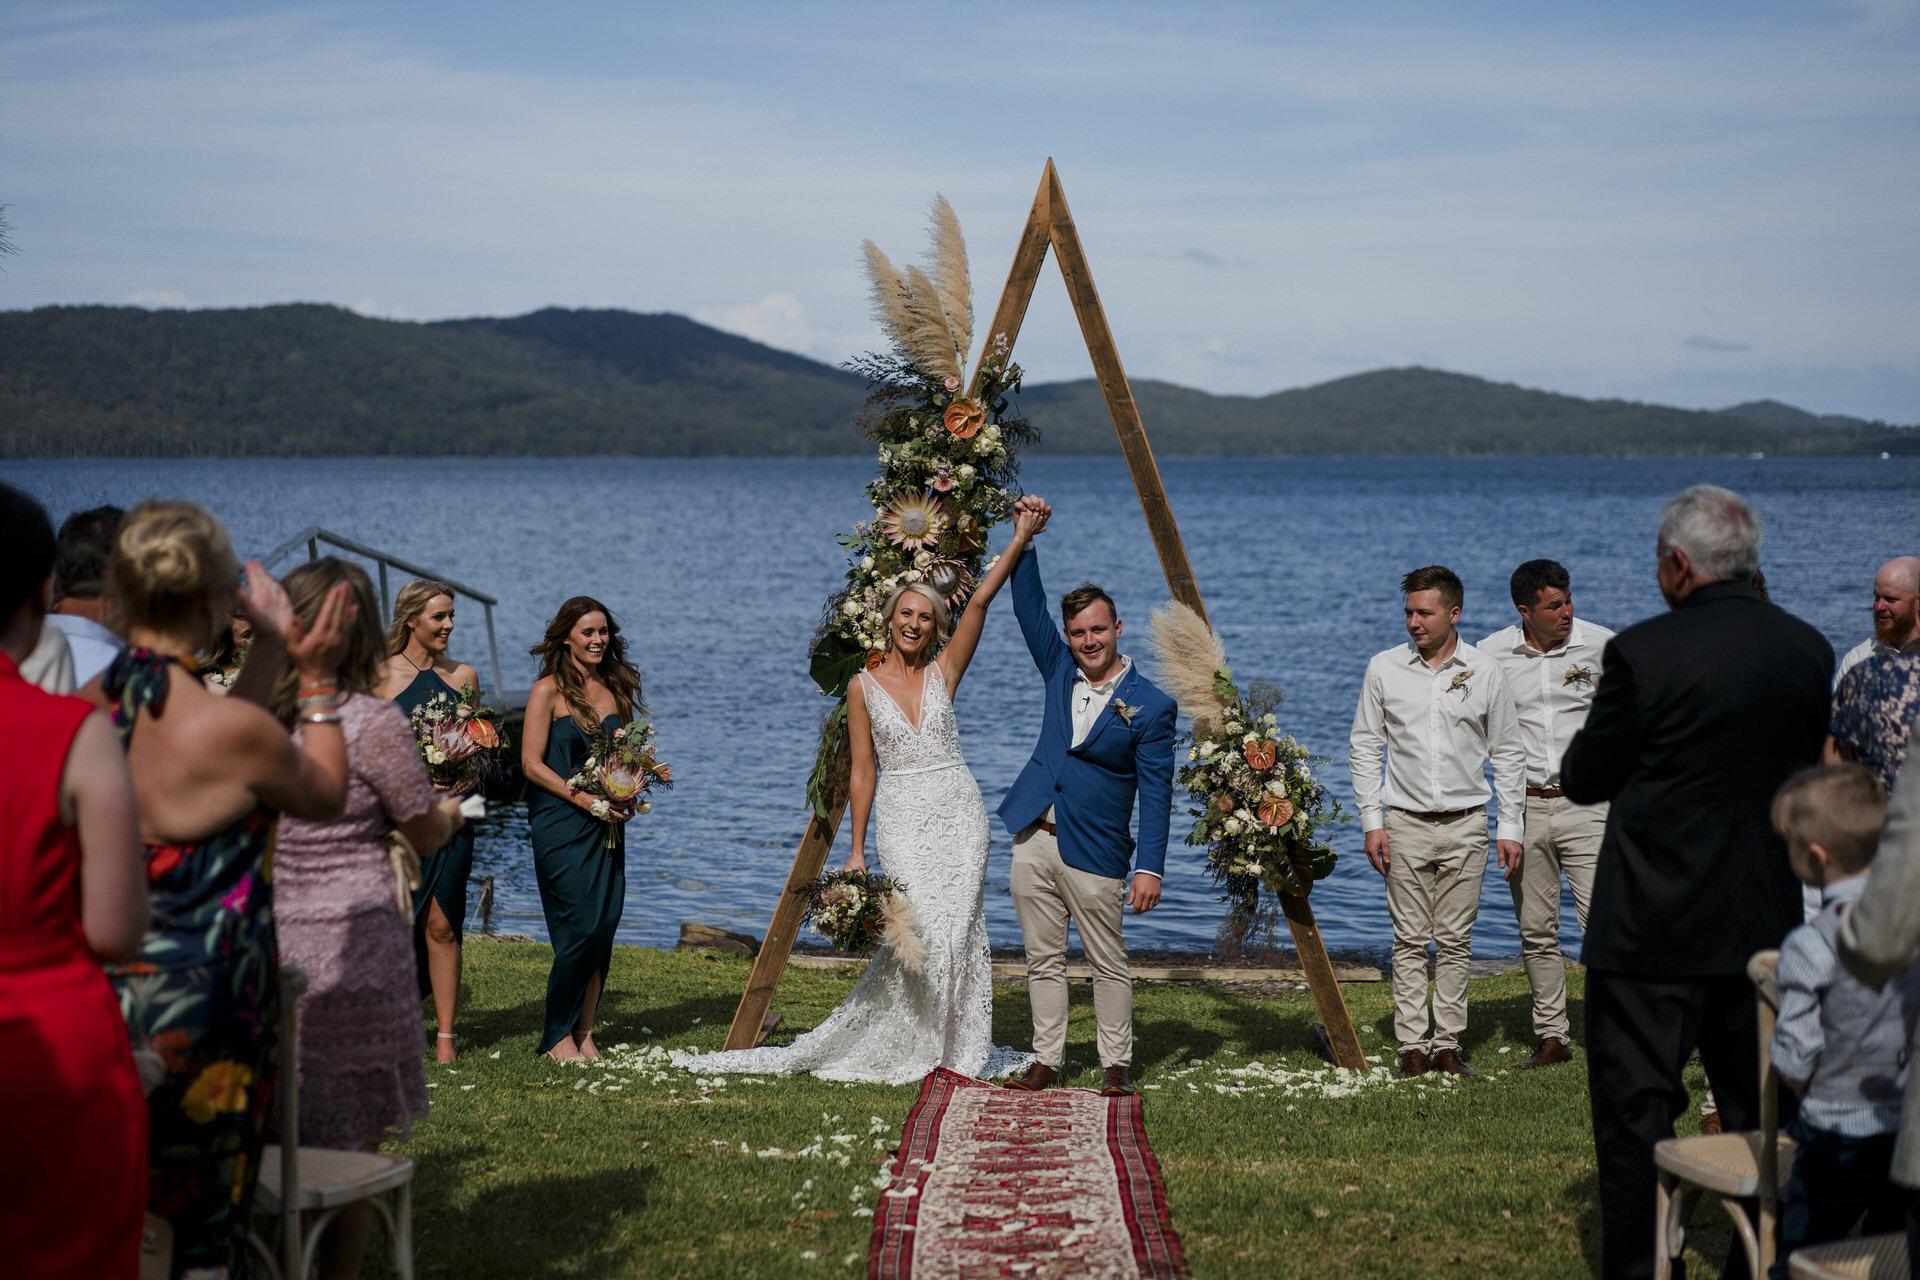 TEE-PEE TENT WEDDING – LIZZIE & JOSH